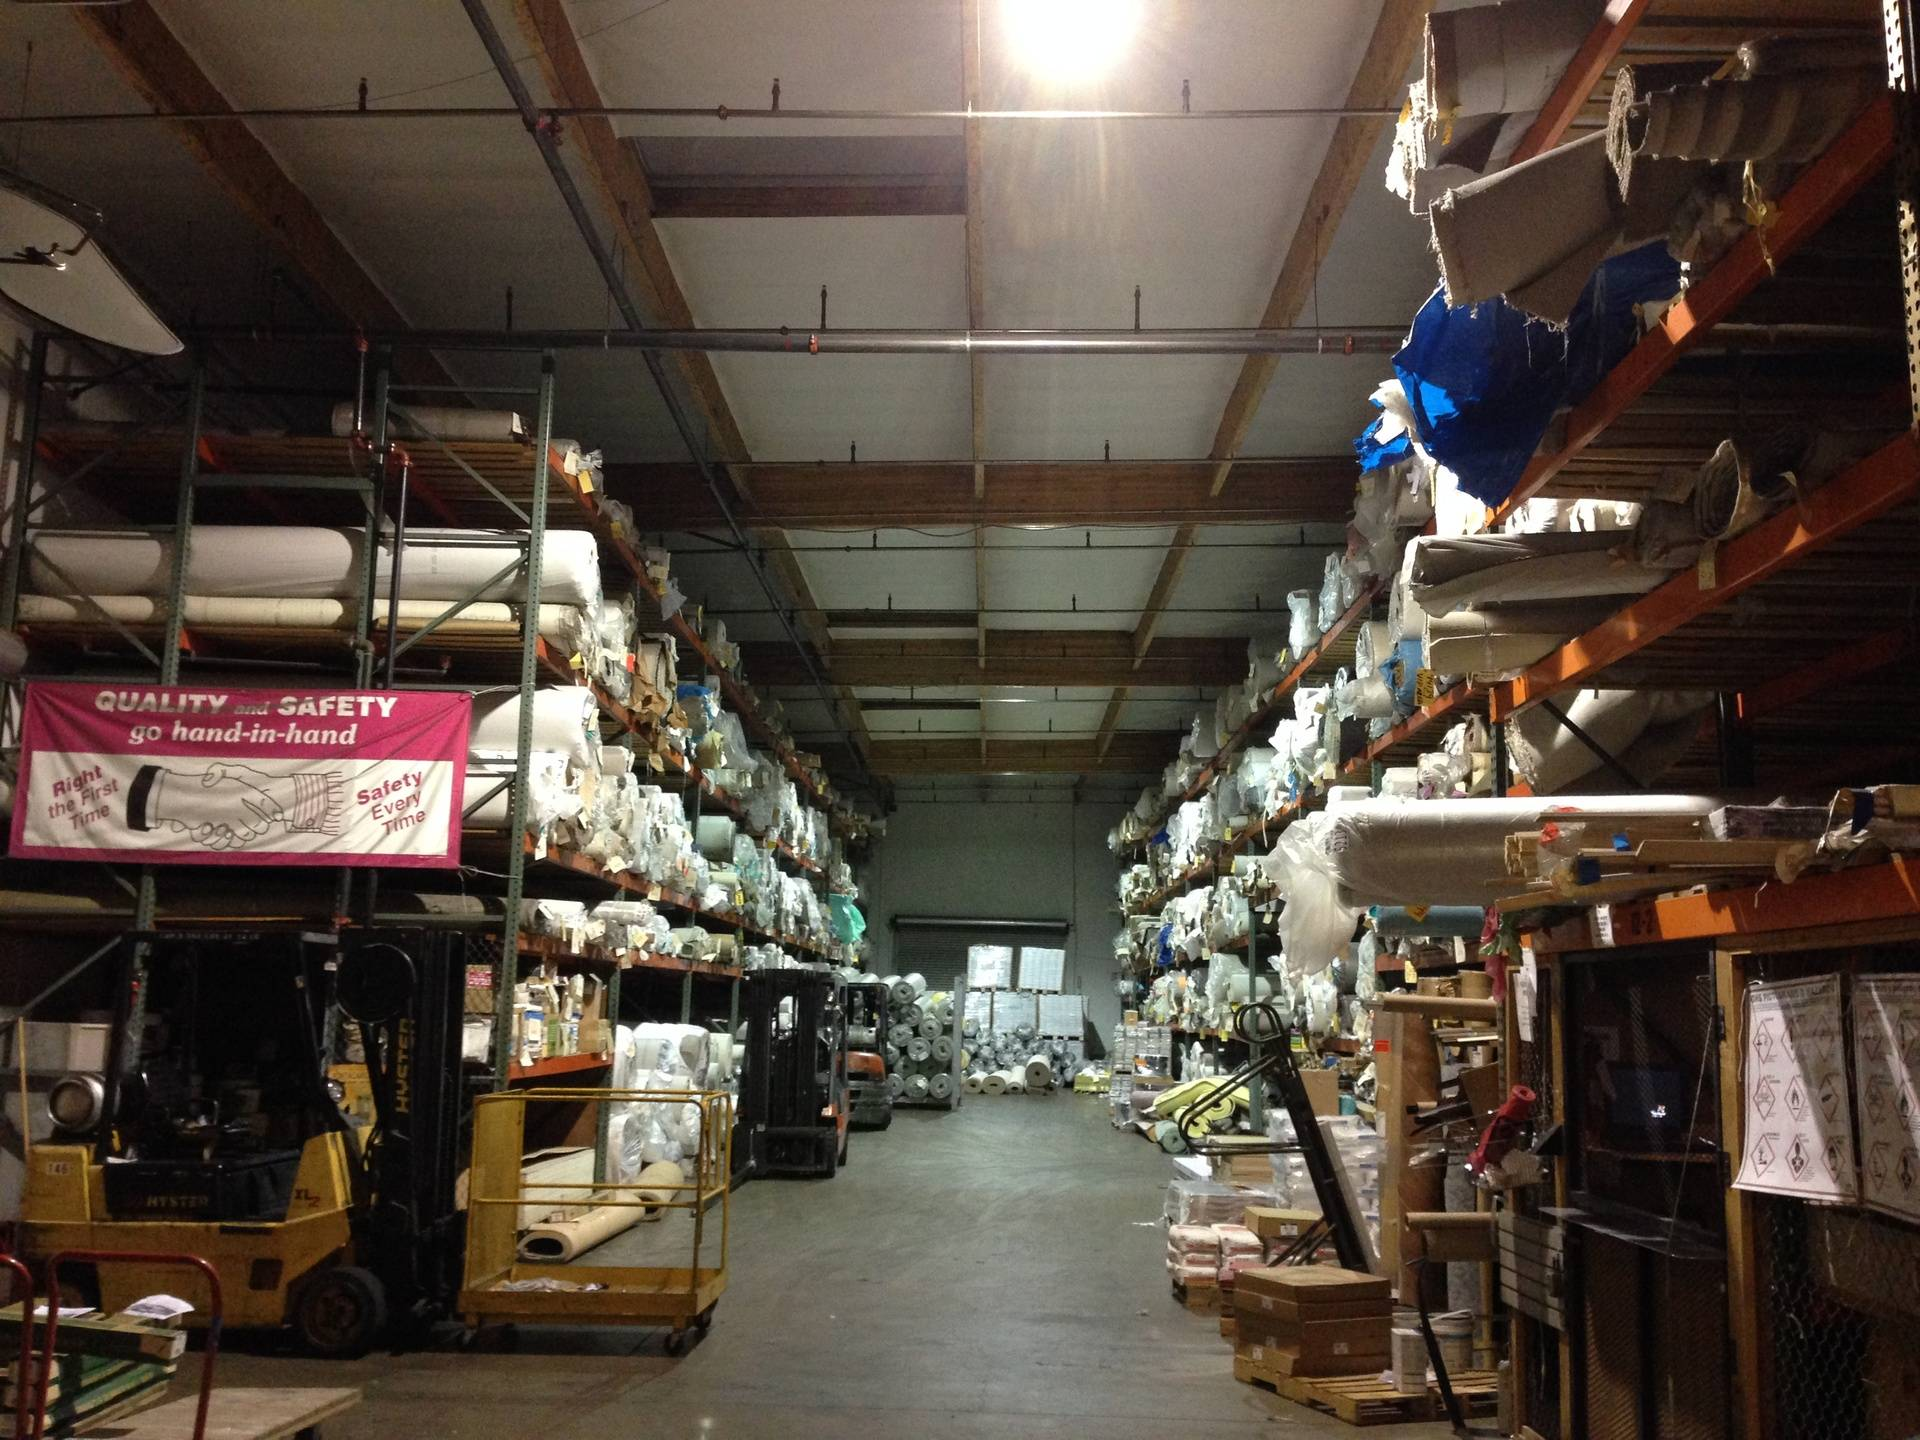 Warehouse High bay lighting